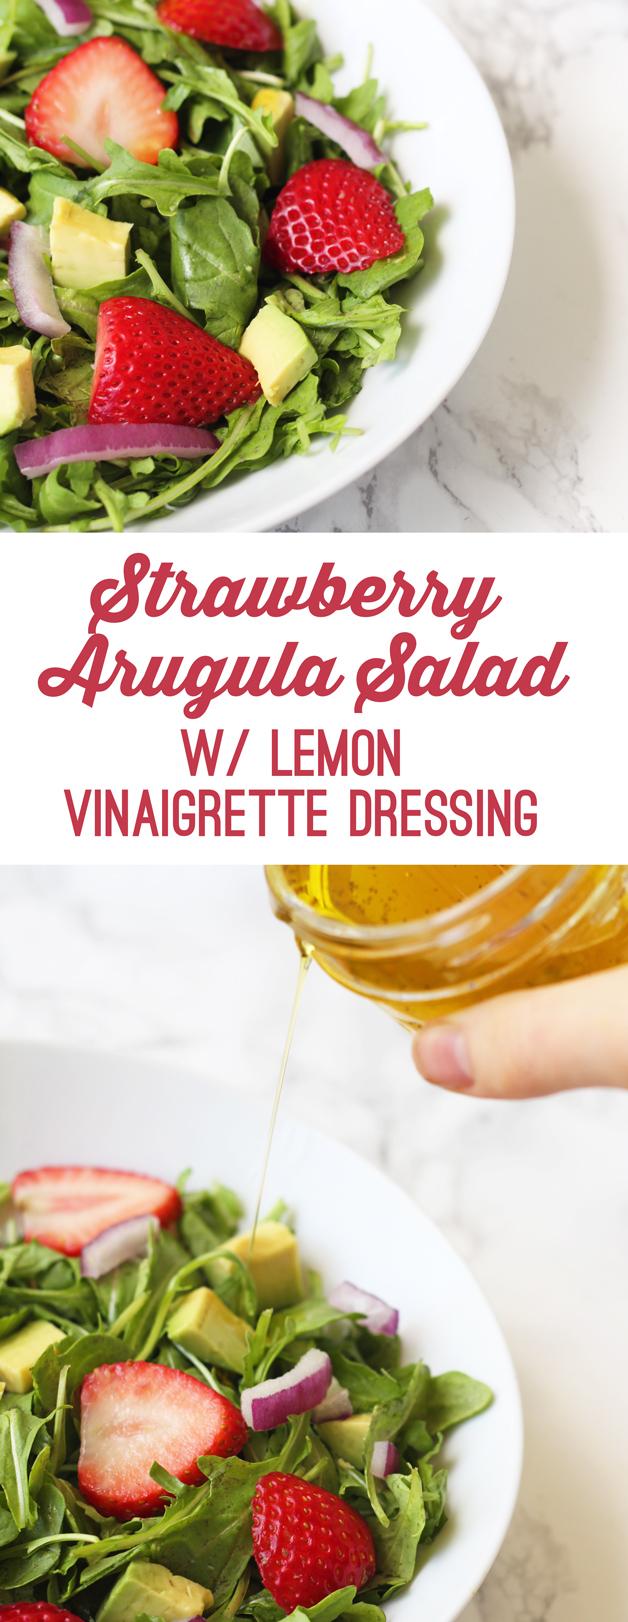 Spring Strawberry Arugula Salad with Lemon Vinagrette (Paleo, AIP, Whole 30)